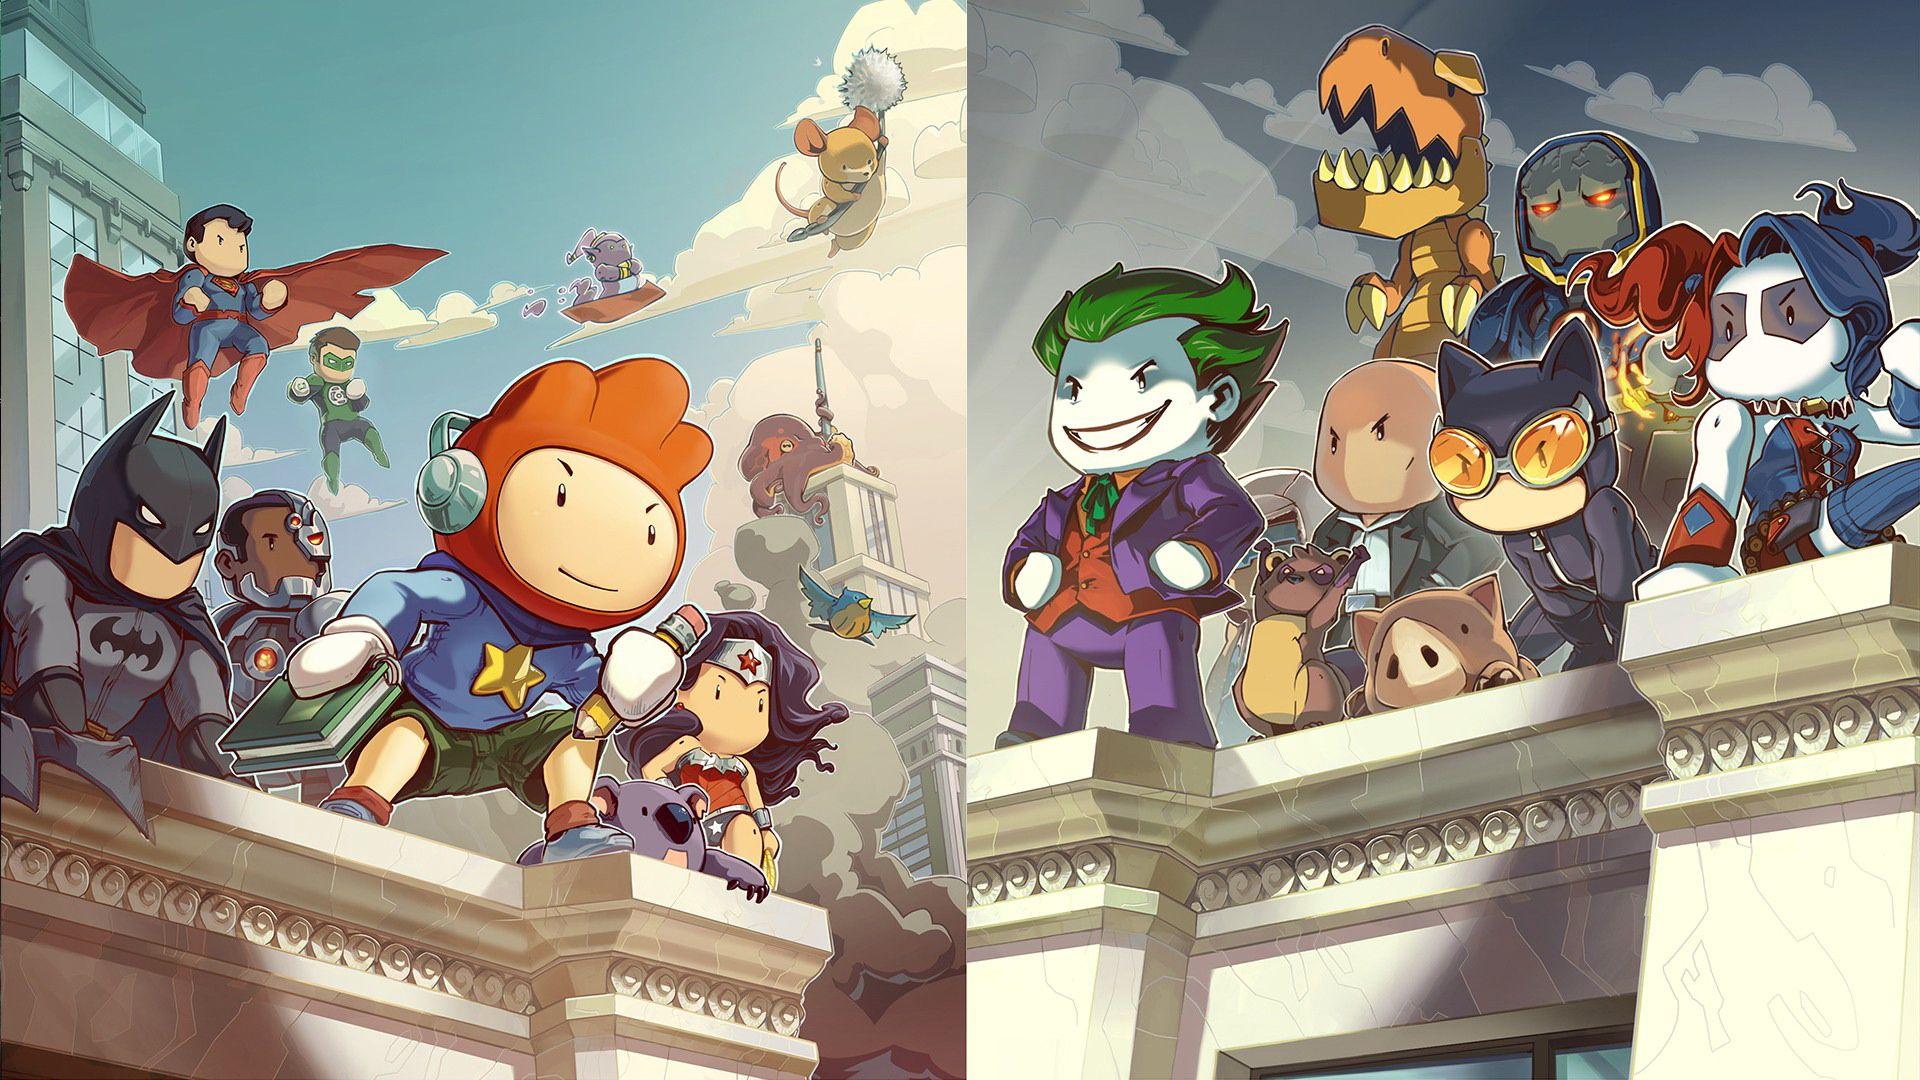 Chibi dc comics characters hd wallpaper chibi chibi marvel dc comics characters hero - Dc characters wallpaper hd ...